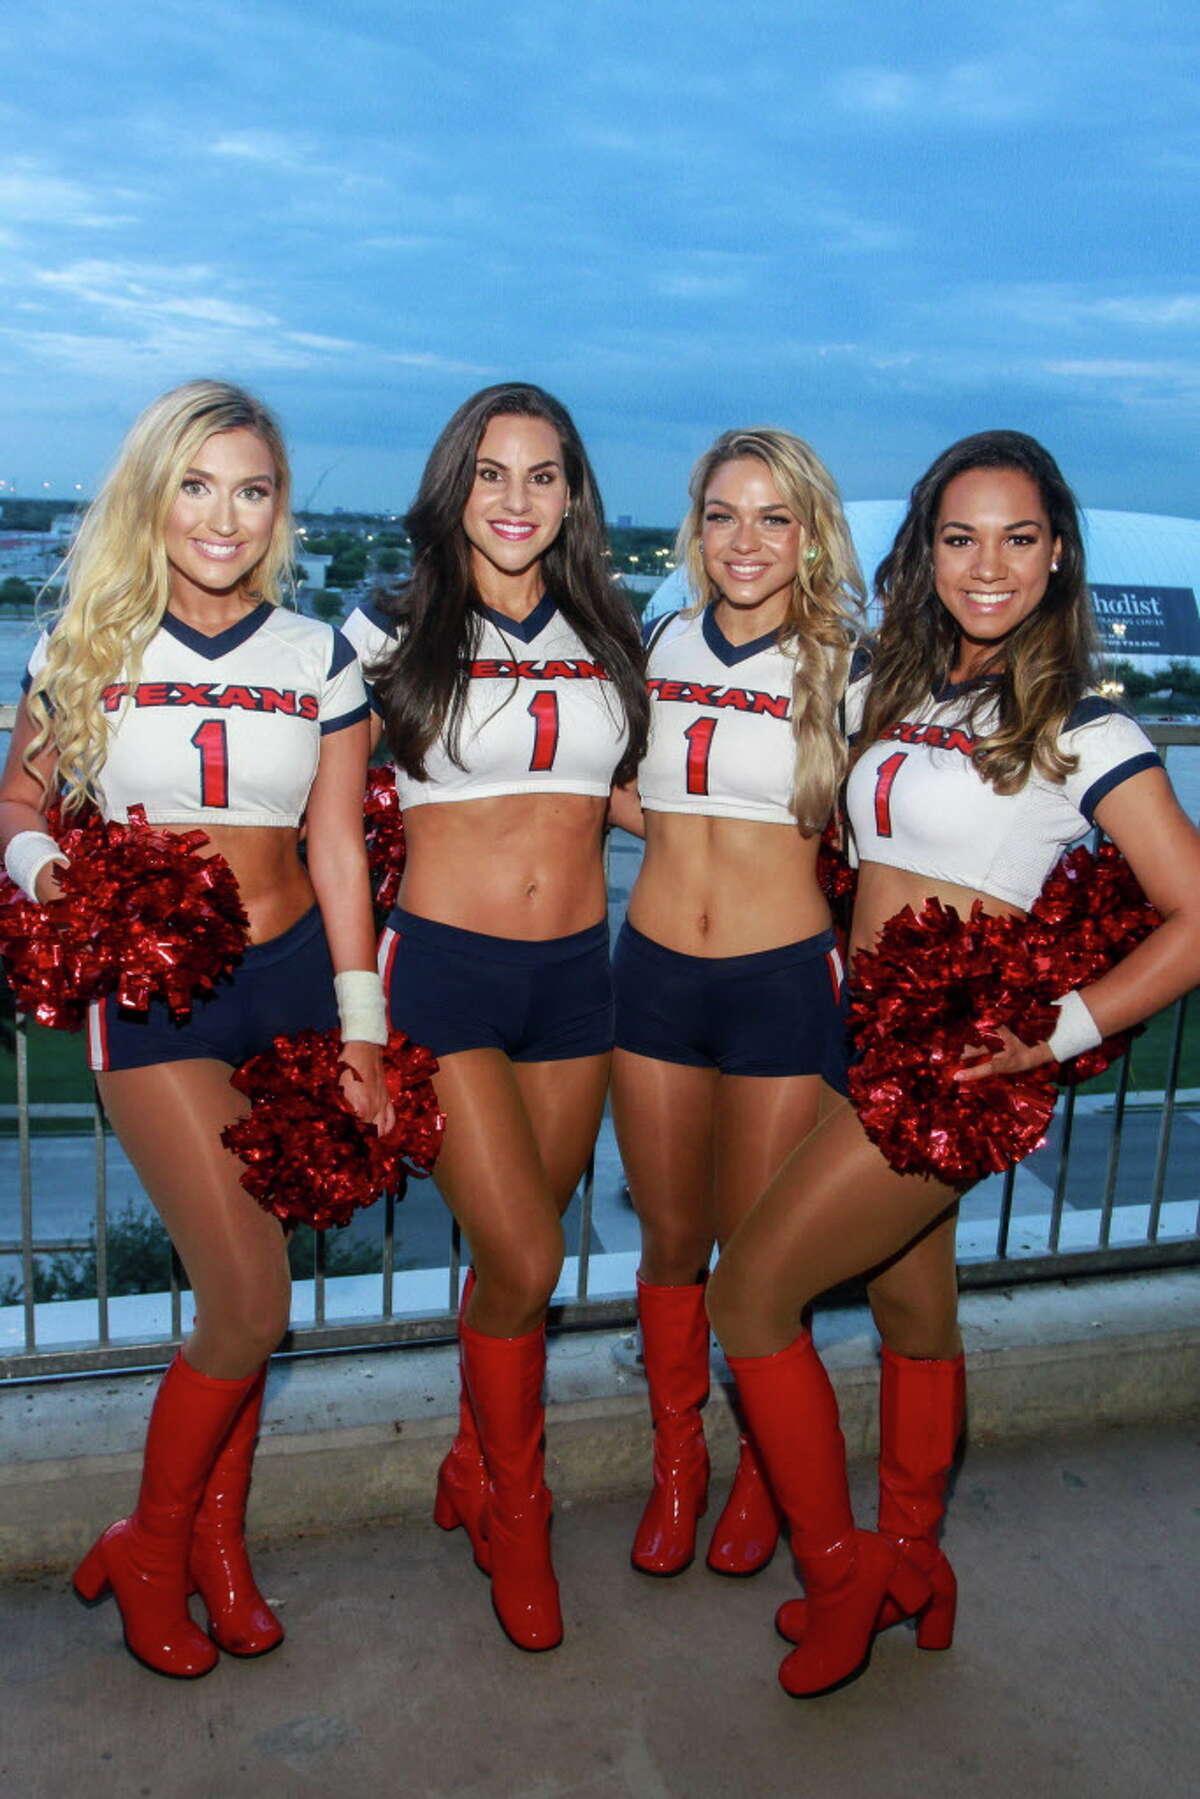 Texan cheerleaders Hannah, from left, Jackie, Meagan and Ashlyn at the Fantasy Football Draft Night at NRG. (For the Chronicle/Gary Fountain, September 26, 2017)